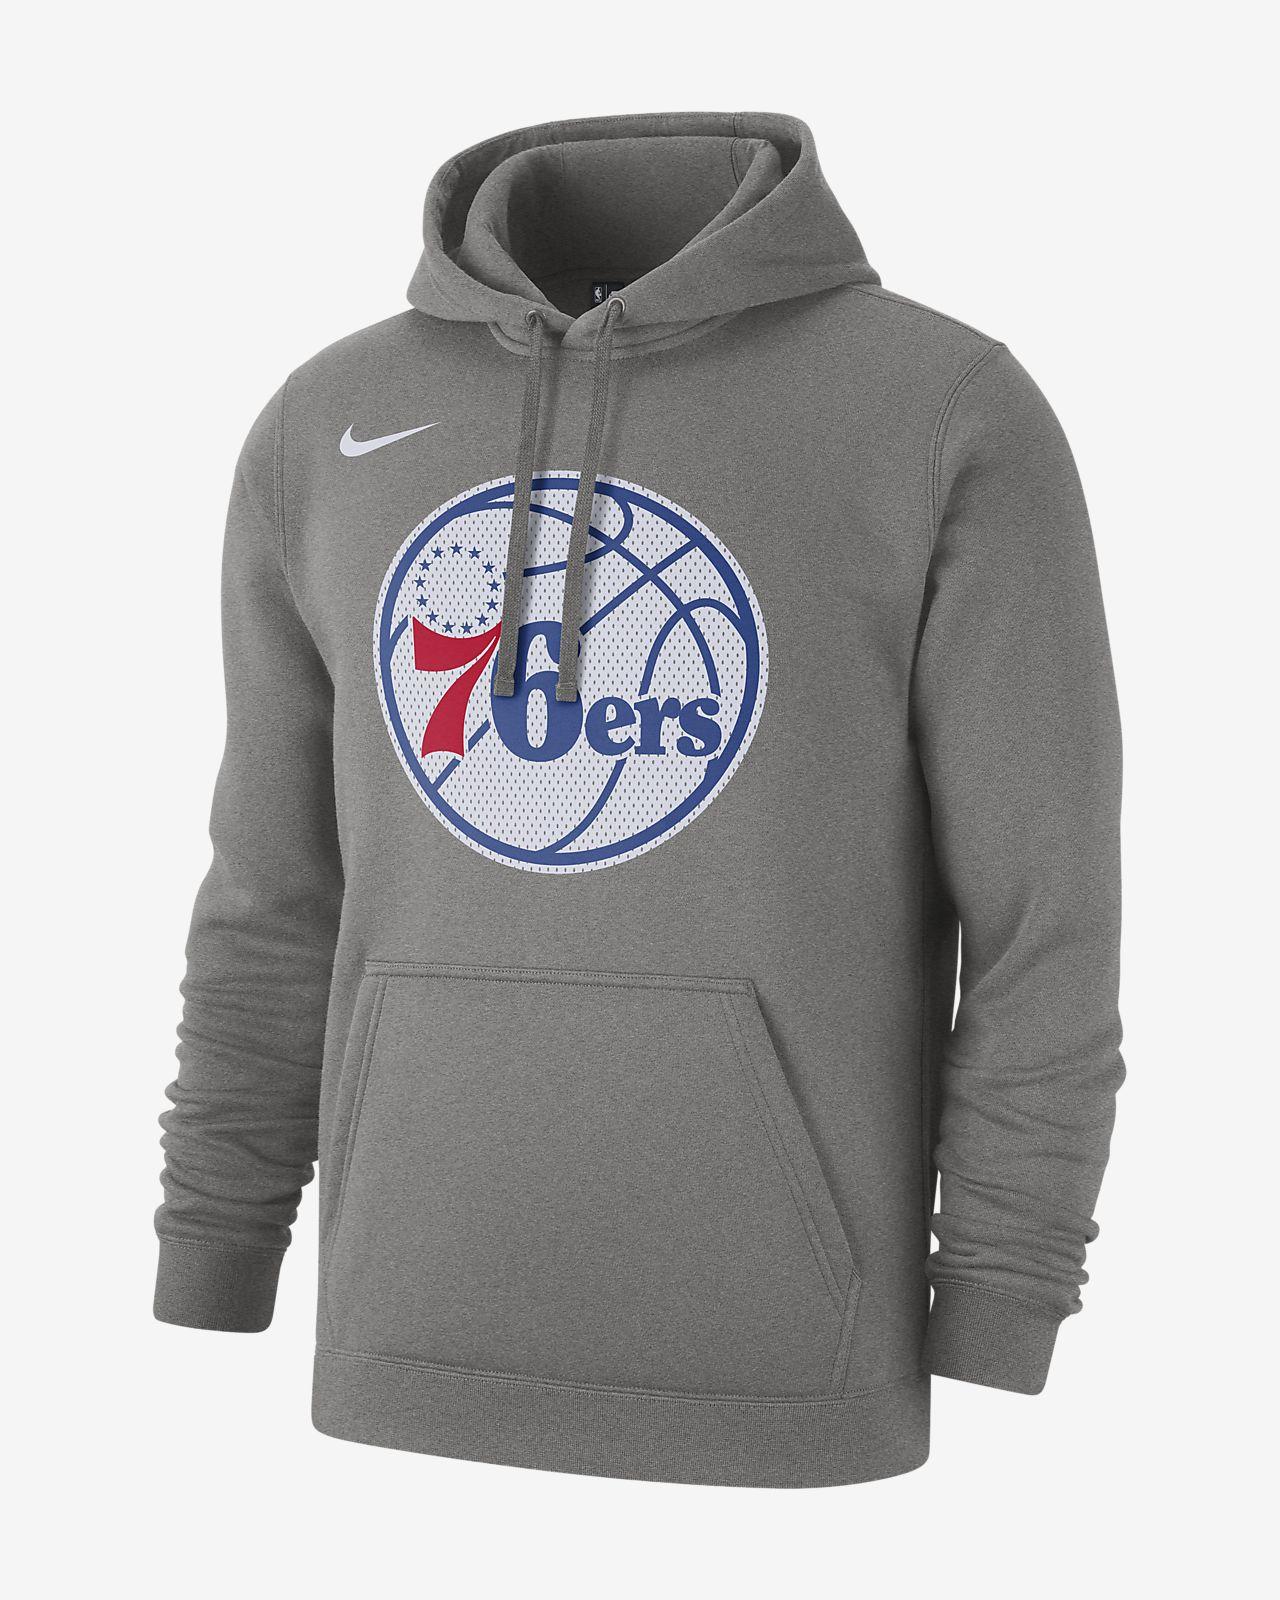 Męska bluza z kapturem NBA Philadelphia 76ers Nike